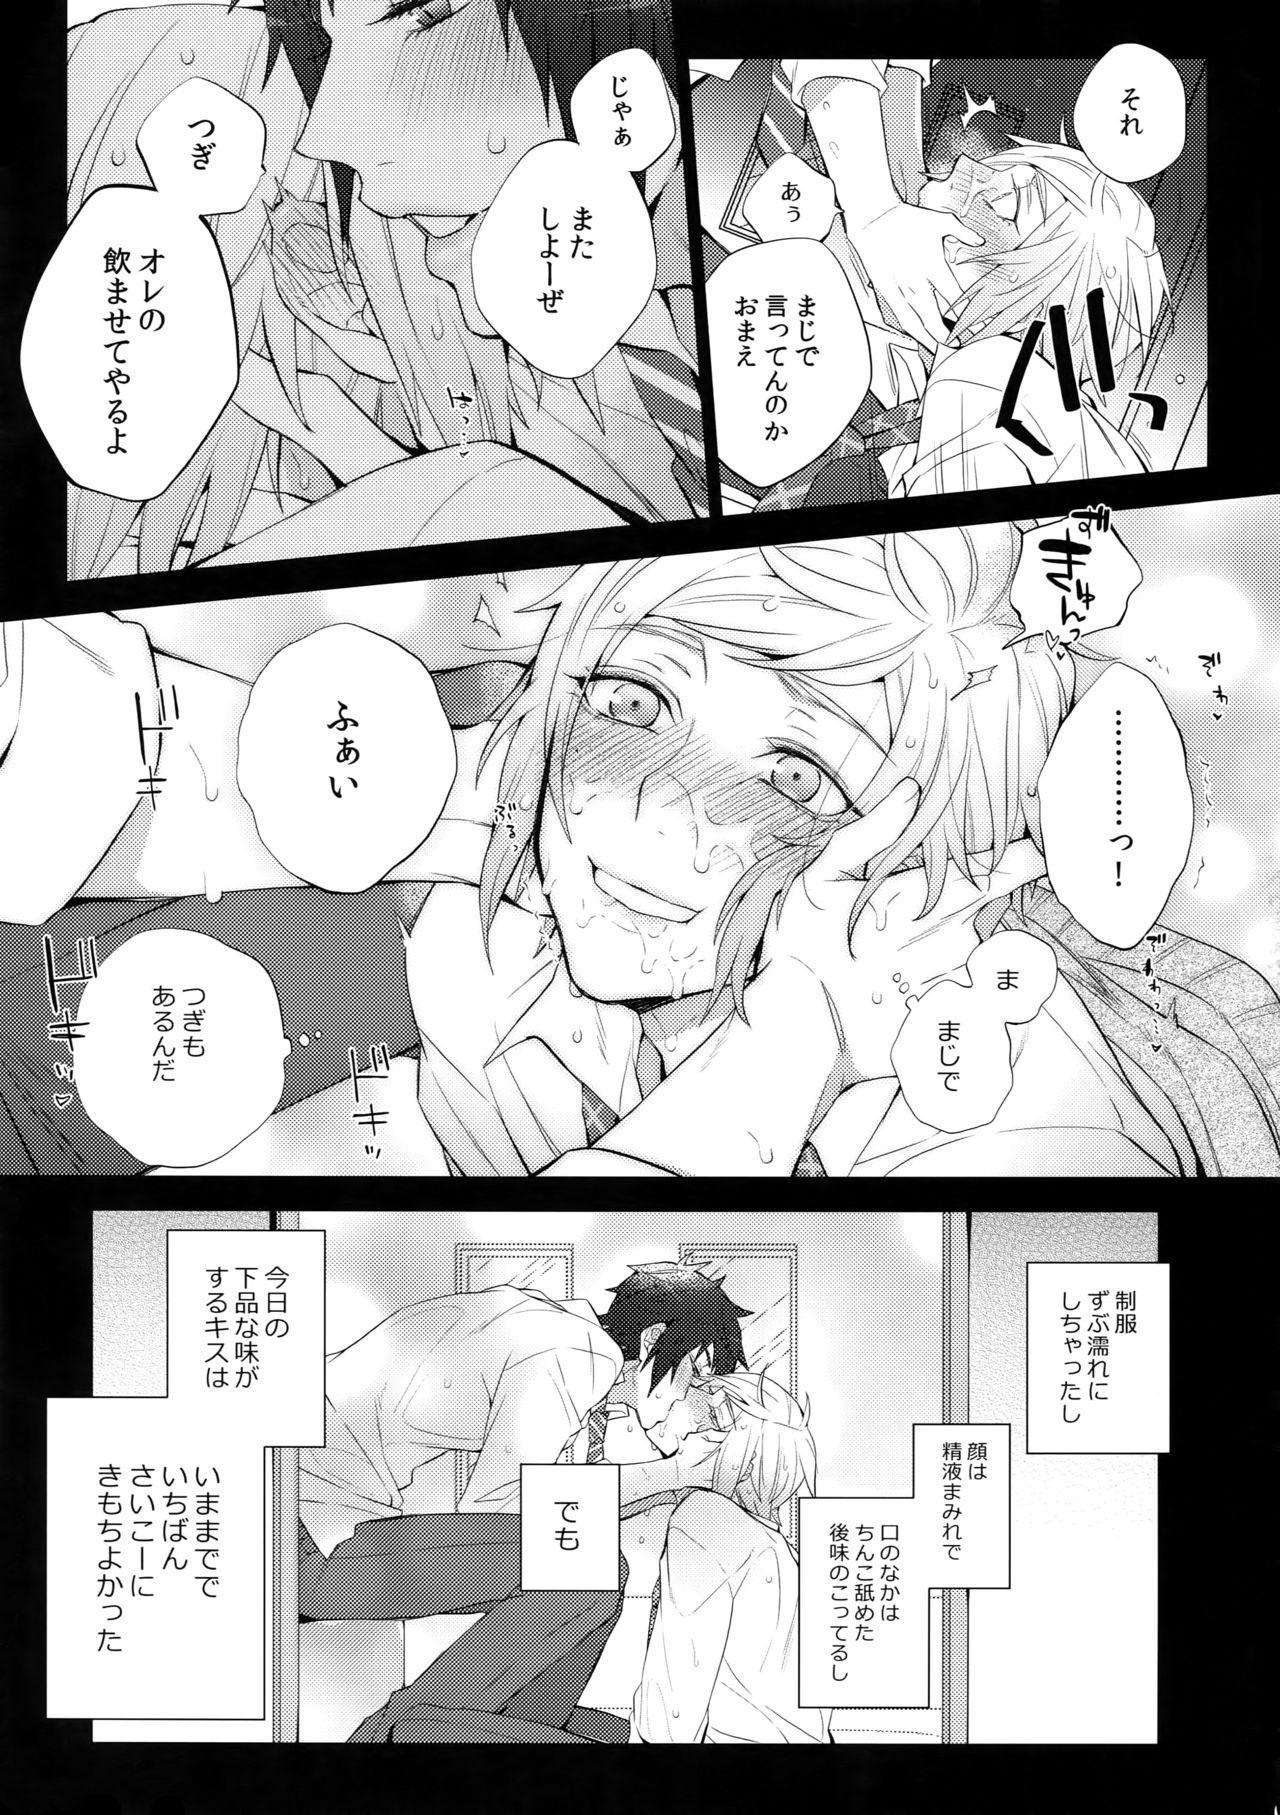 Yuri Kiss 2 11